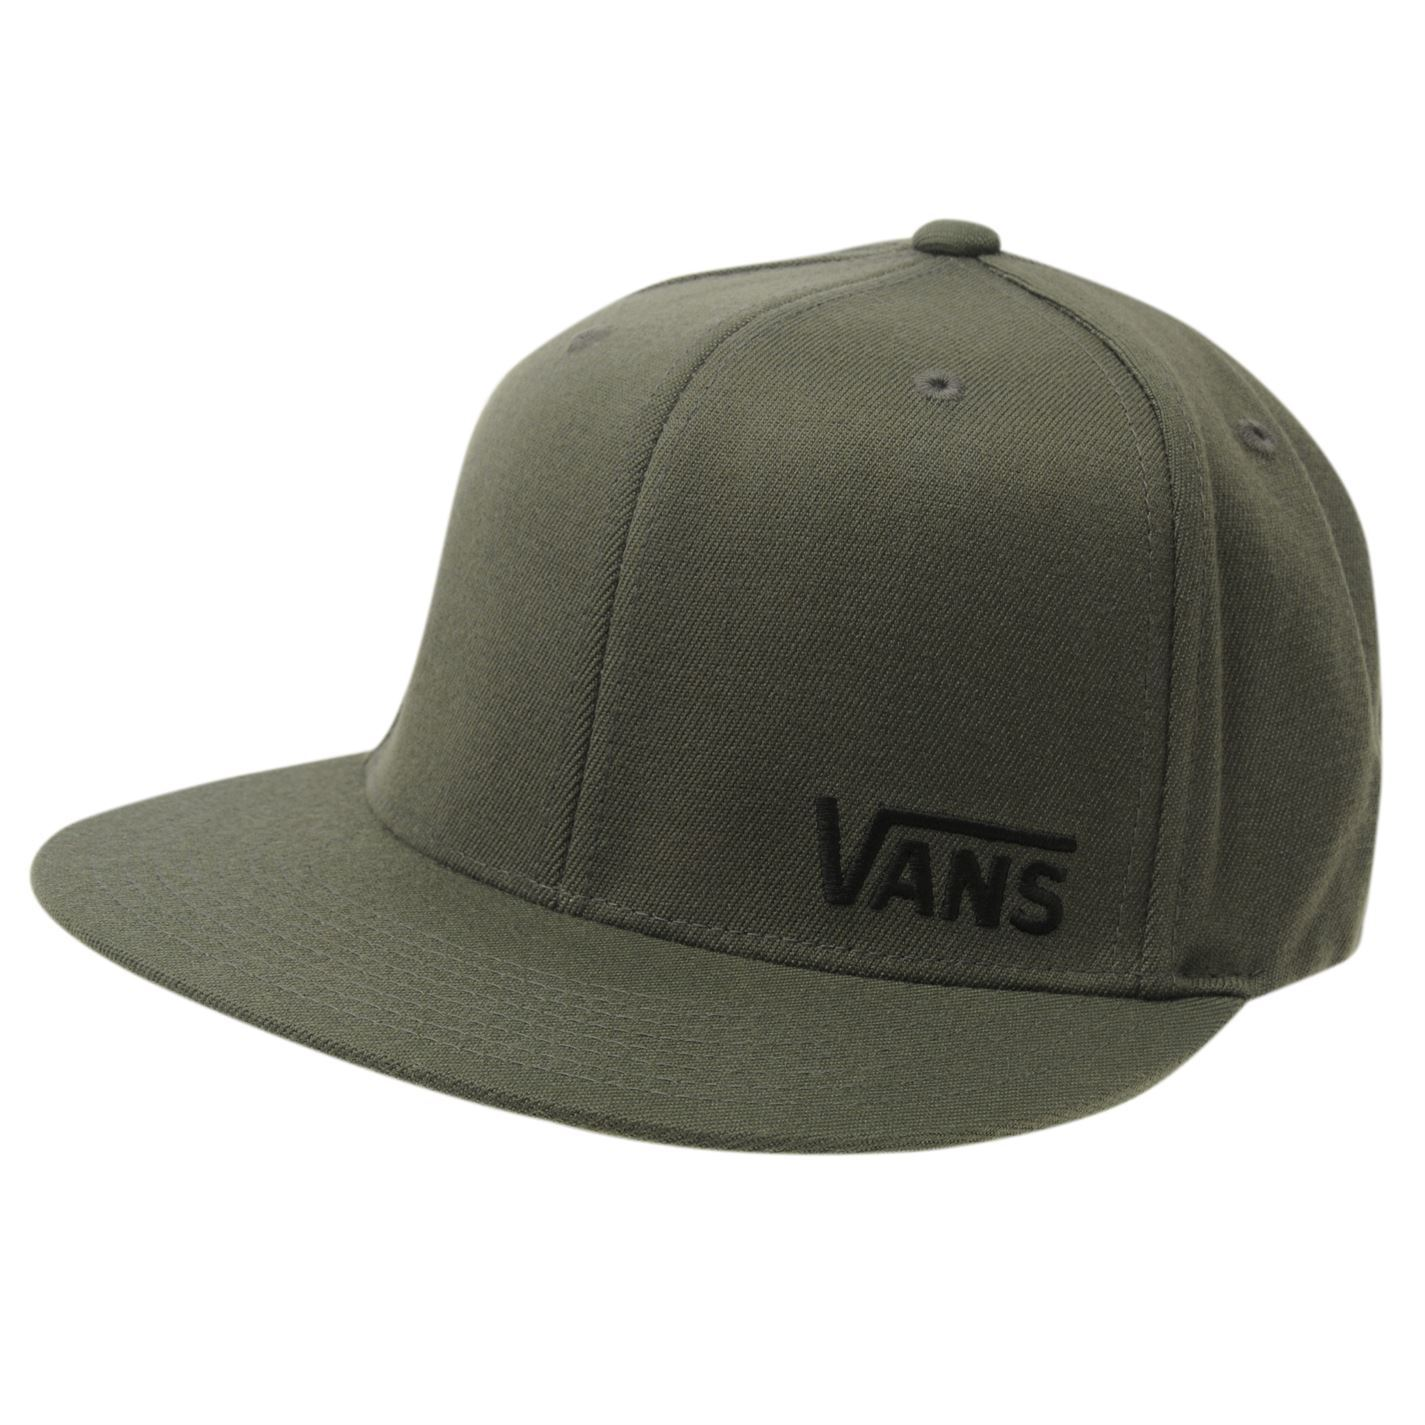 b73cb8ca Vans Mens Splitz Caps Baseball Hats Sports Headwear Accessories | eBay